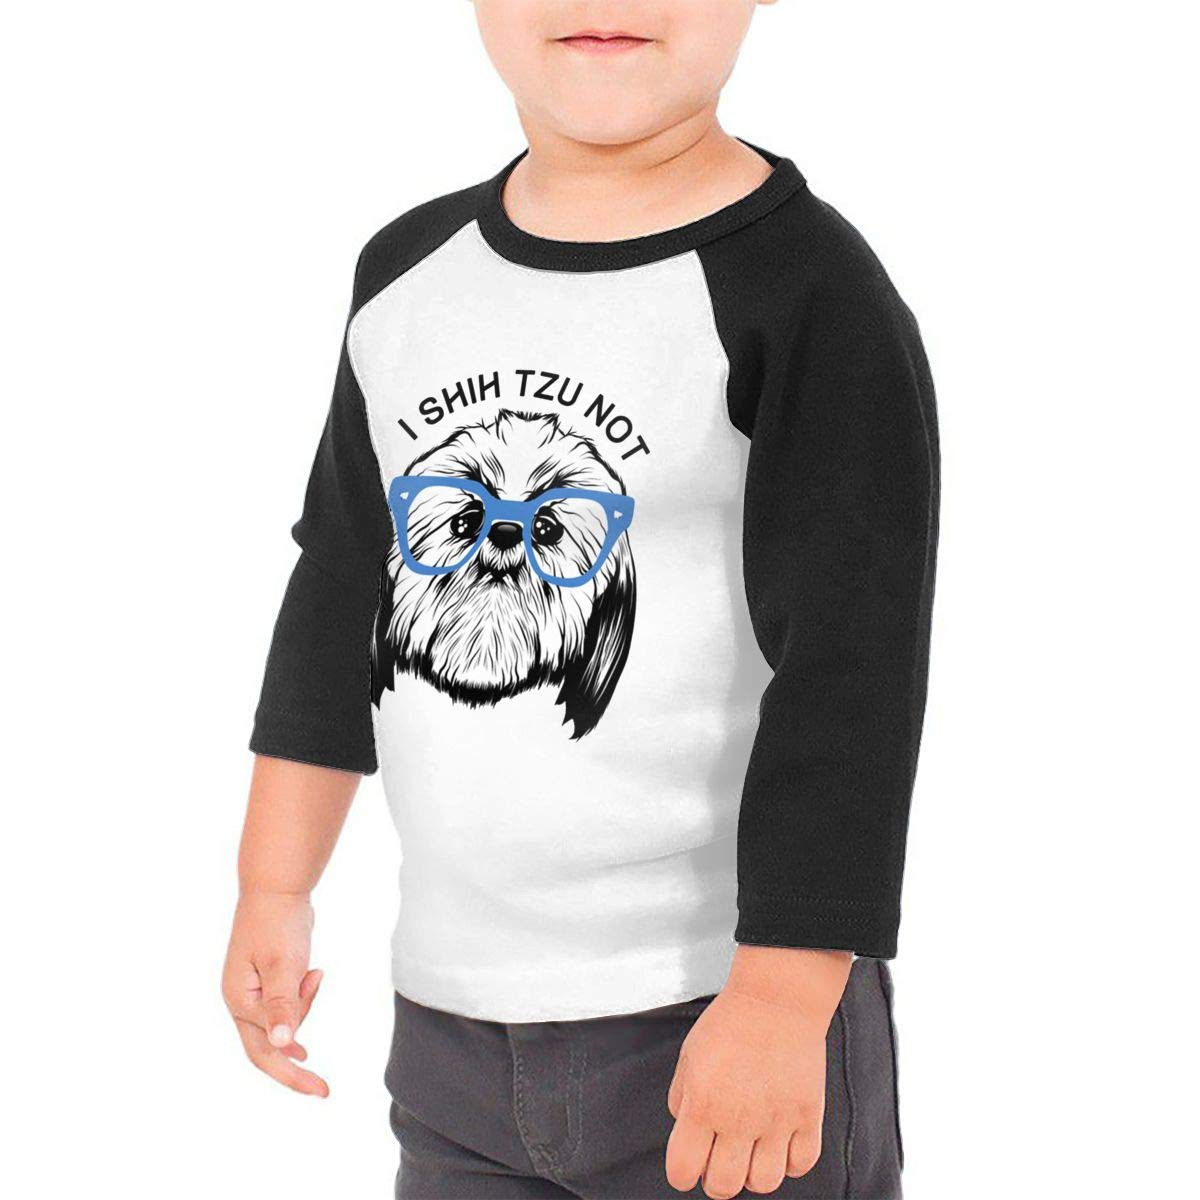 I Shih Tzu Not Unisex Toddler Baseball Jersey Contrast 3//4 Sleeves Tee